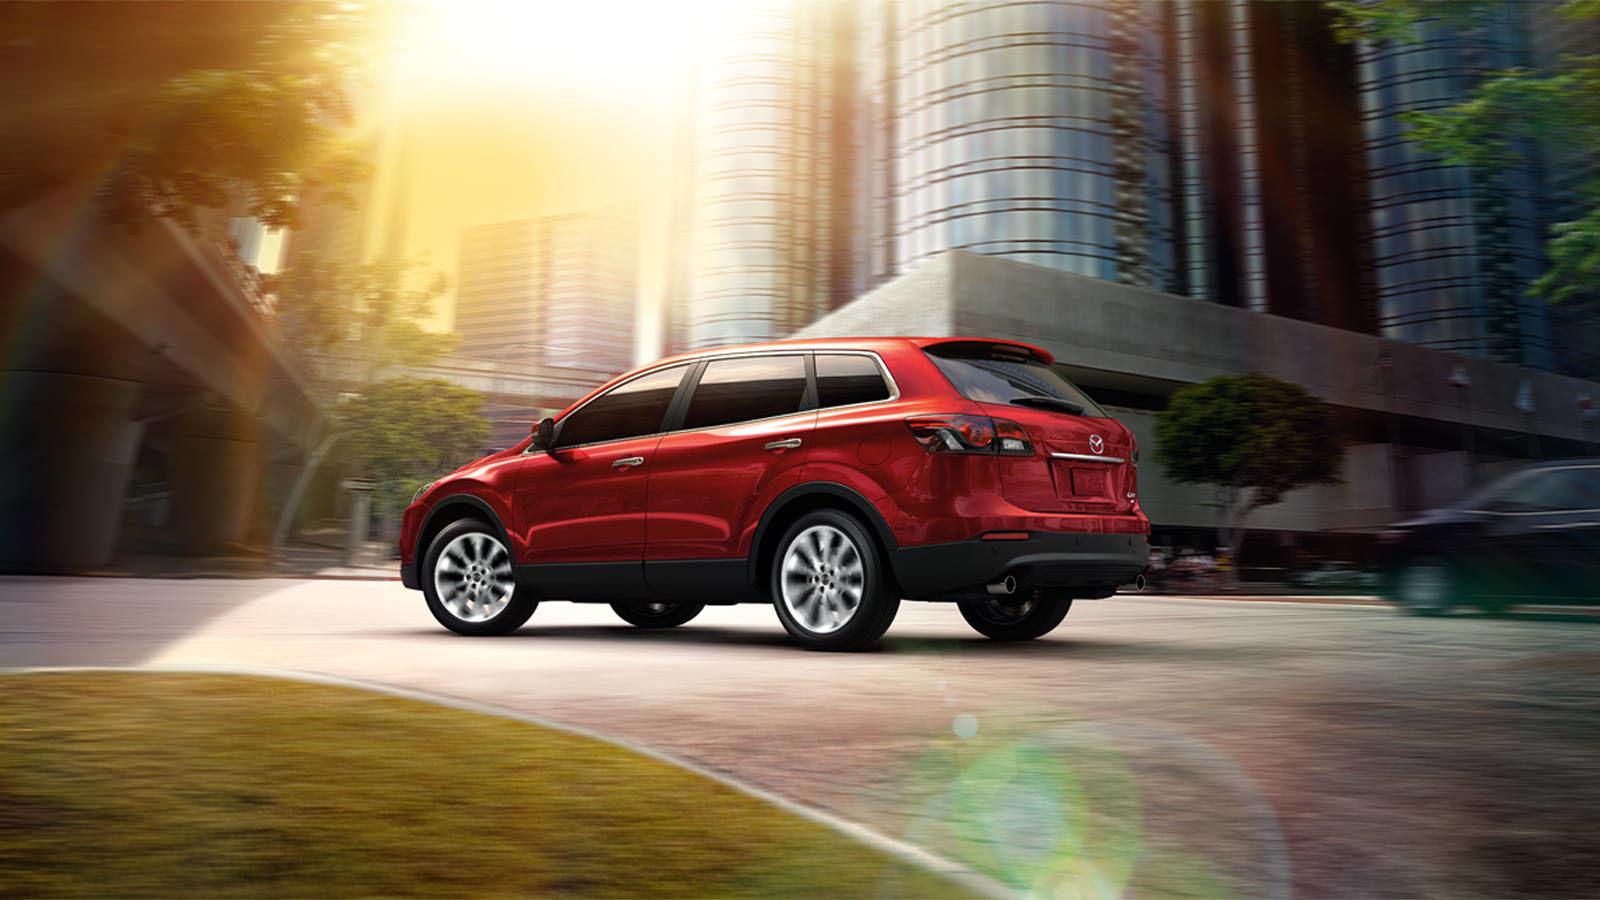 Kramer Mazda | 2015 Mazda CX-9 – Comfortable, spacious, and fun to drive Picture 1